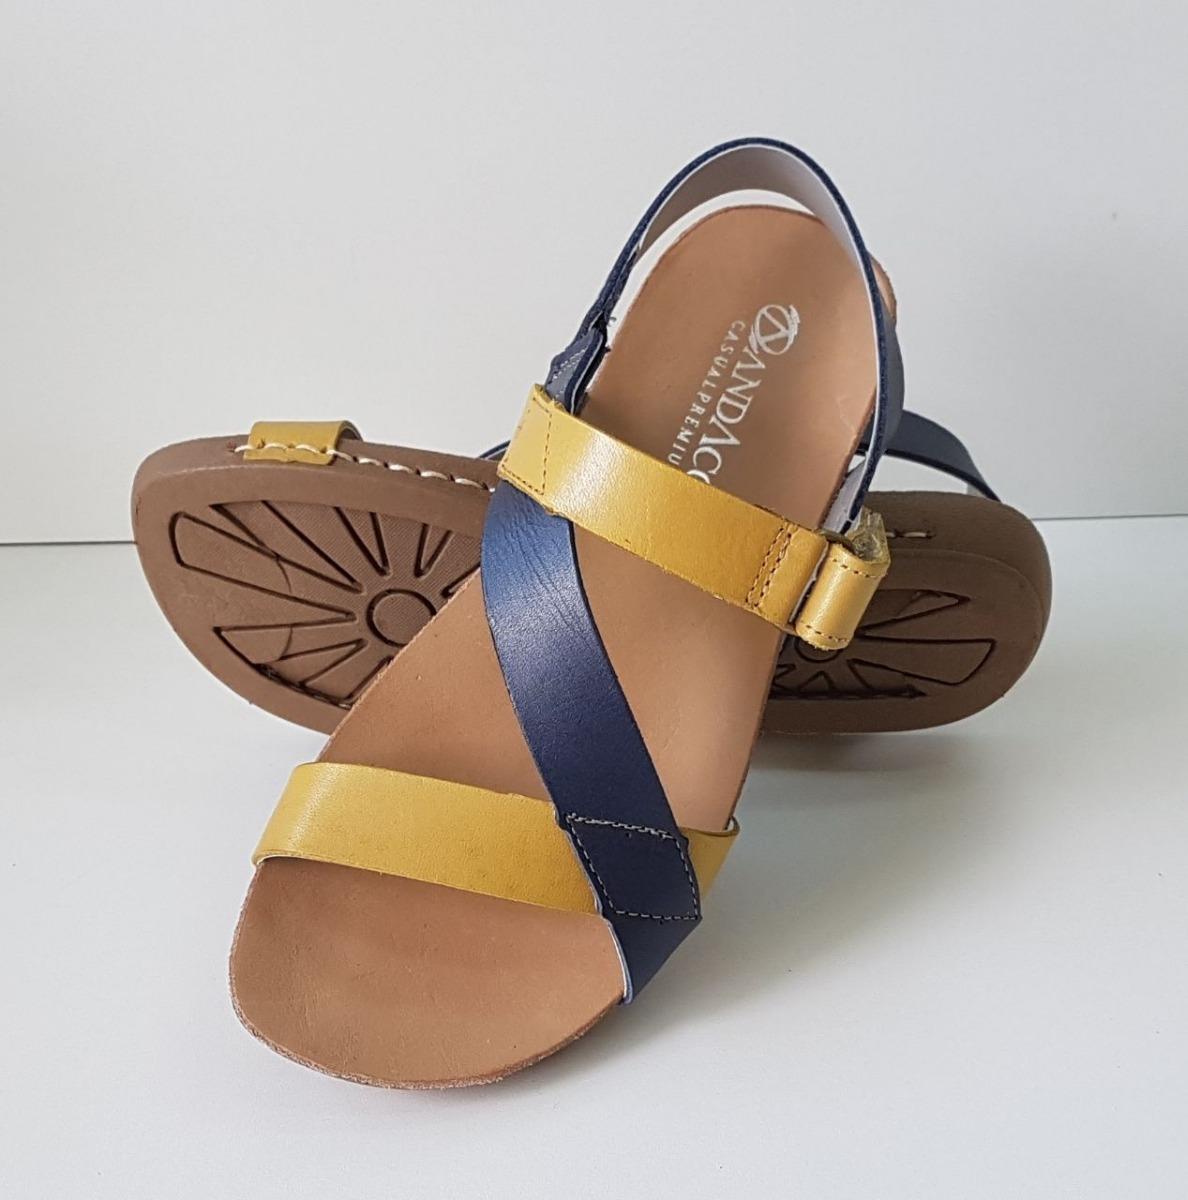 d05cea706 sandália de couro feminina andacco. Carregando zoom.